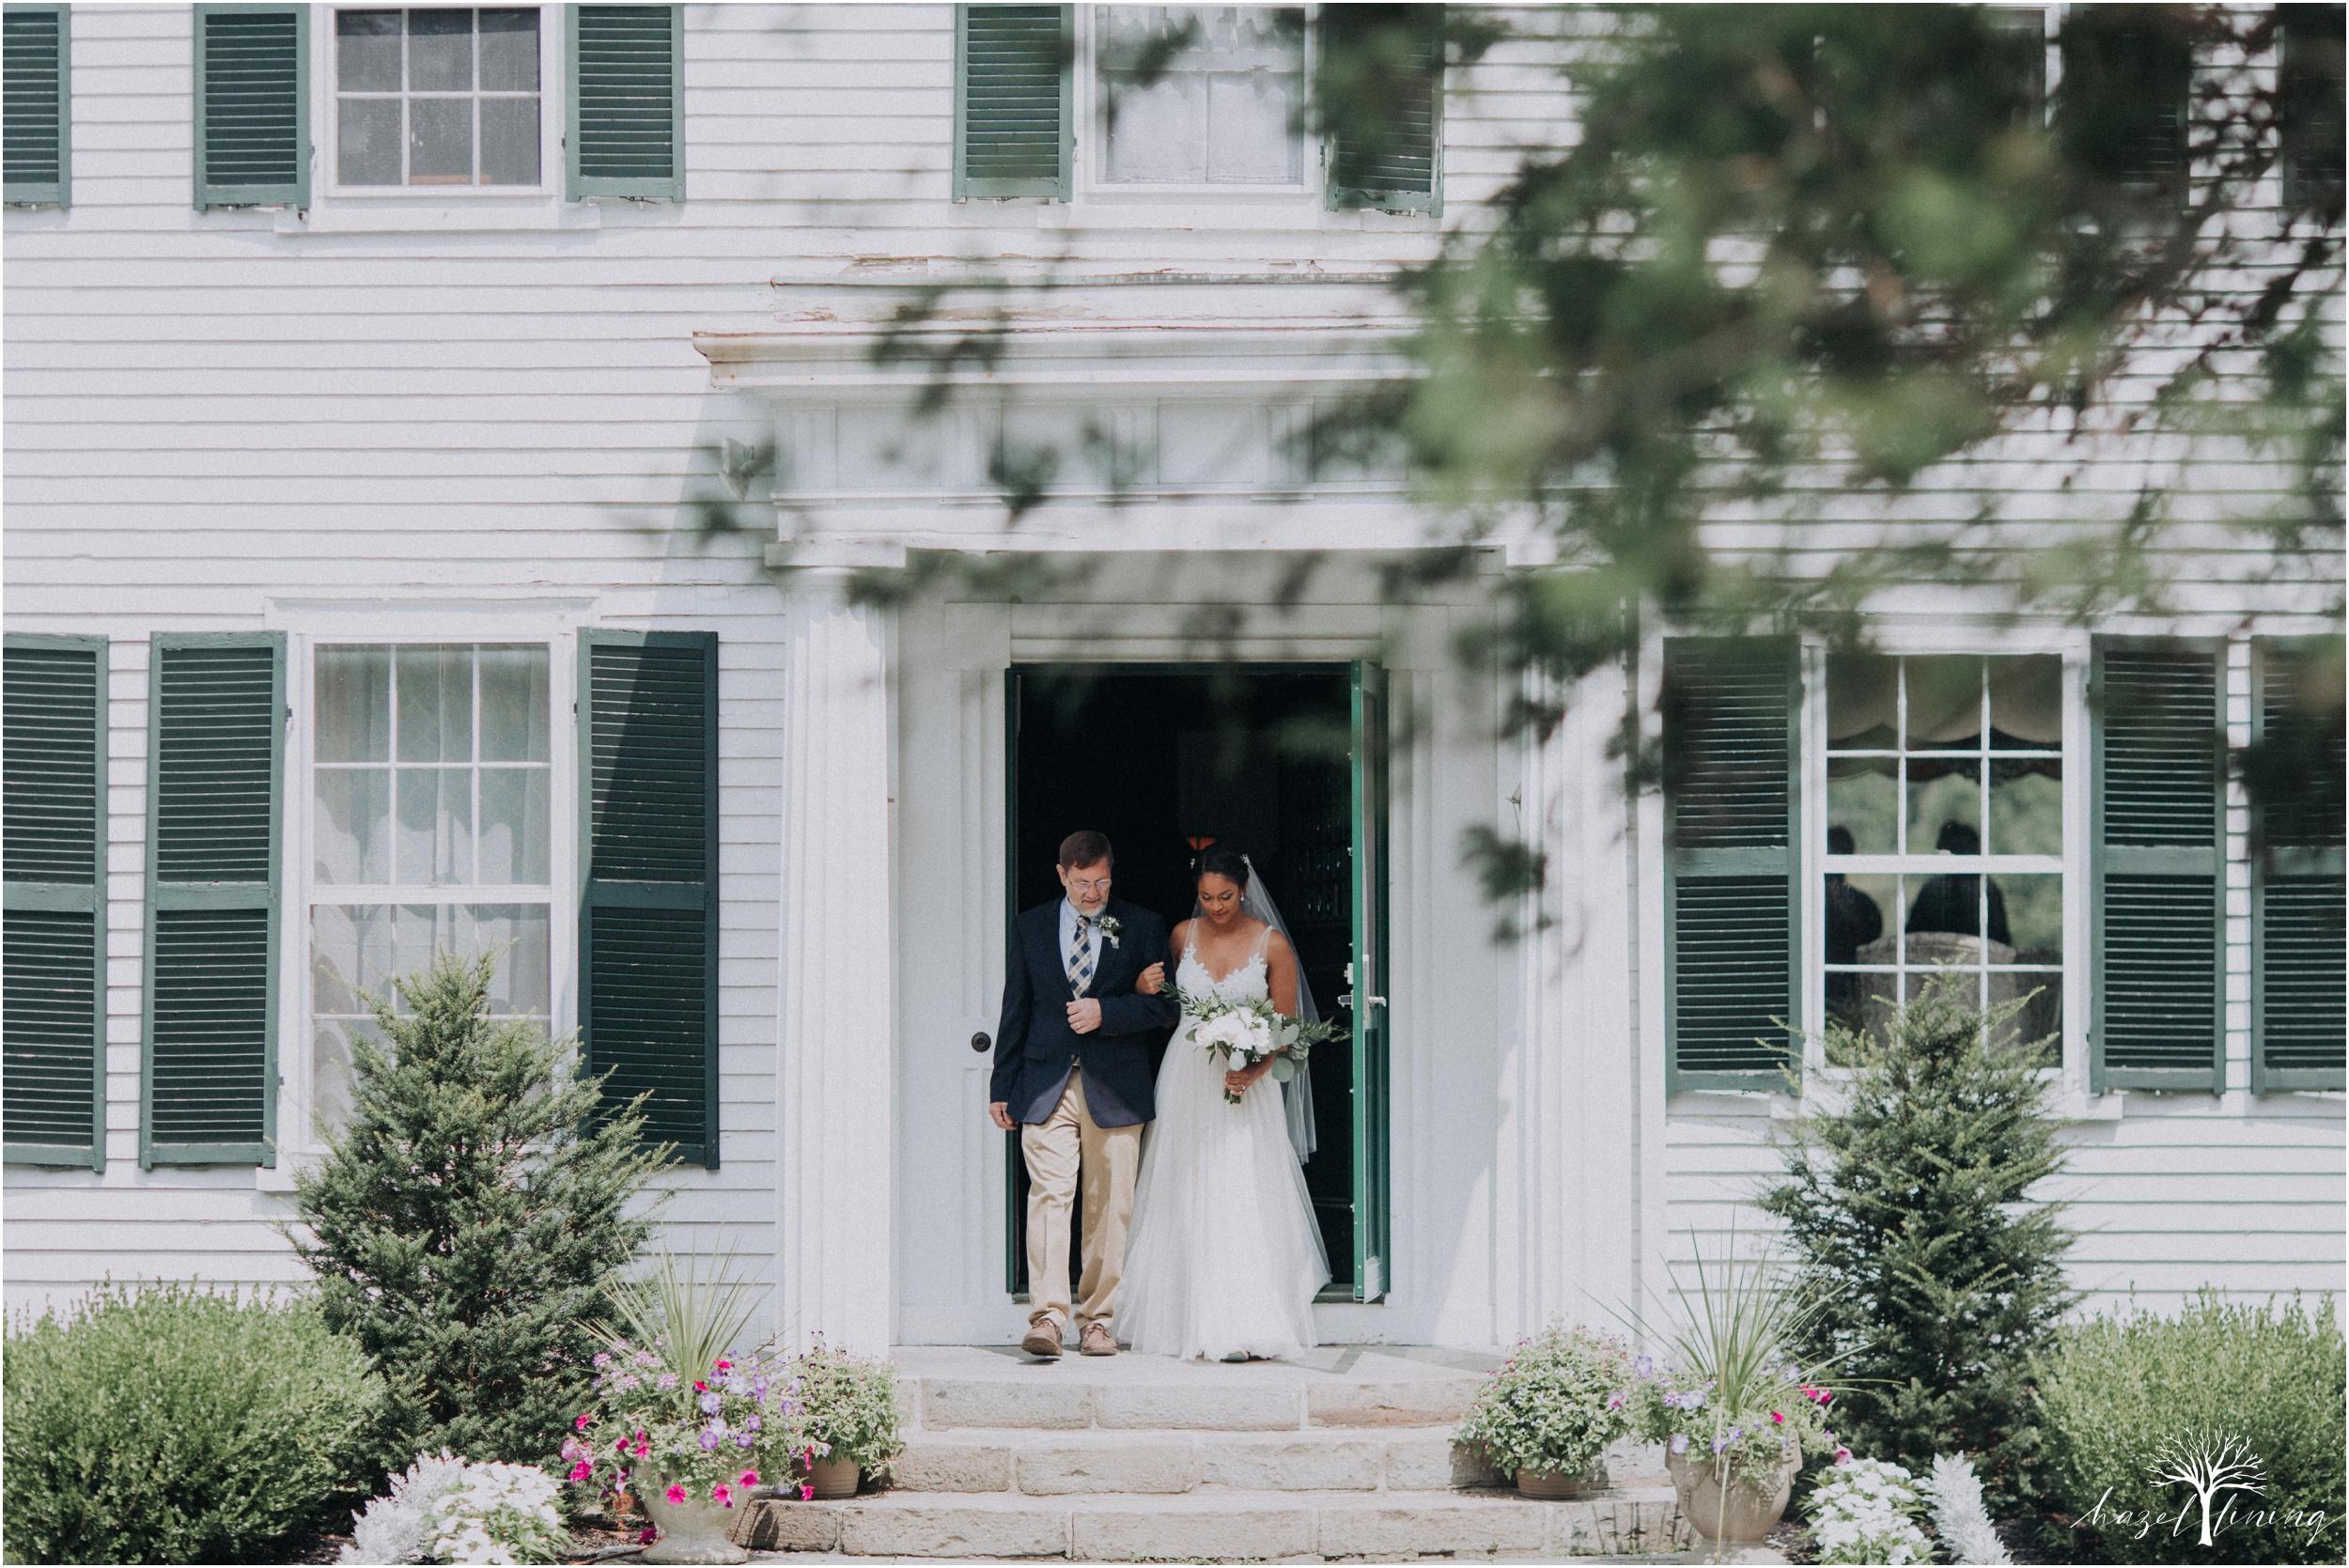 mariah-kreyling-samuel-sherratt-sherrattwiththeworld-peirce-farm-at-witch-hill-boston-massachusetts-wedding-photography-hazel-lining-travel-wedding-elopement-photography_0074.jpg